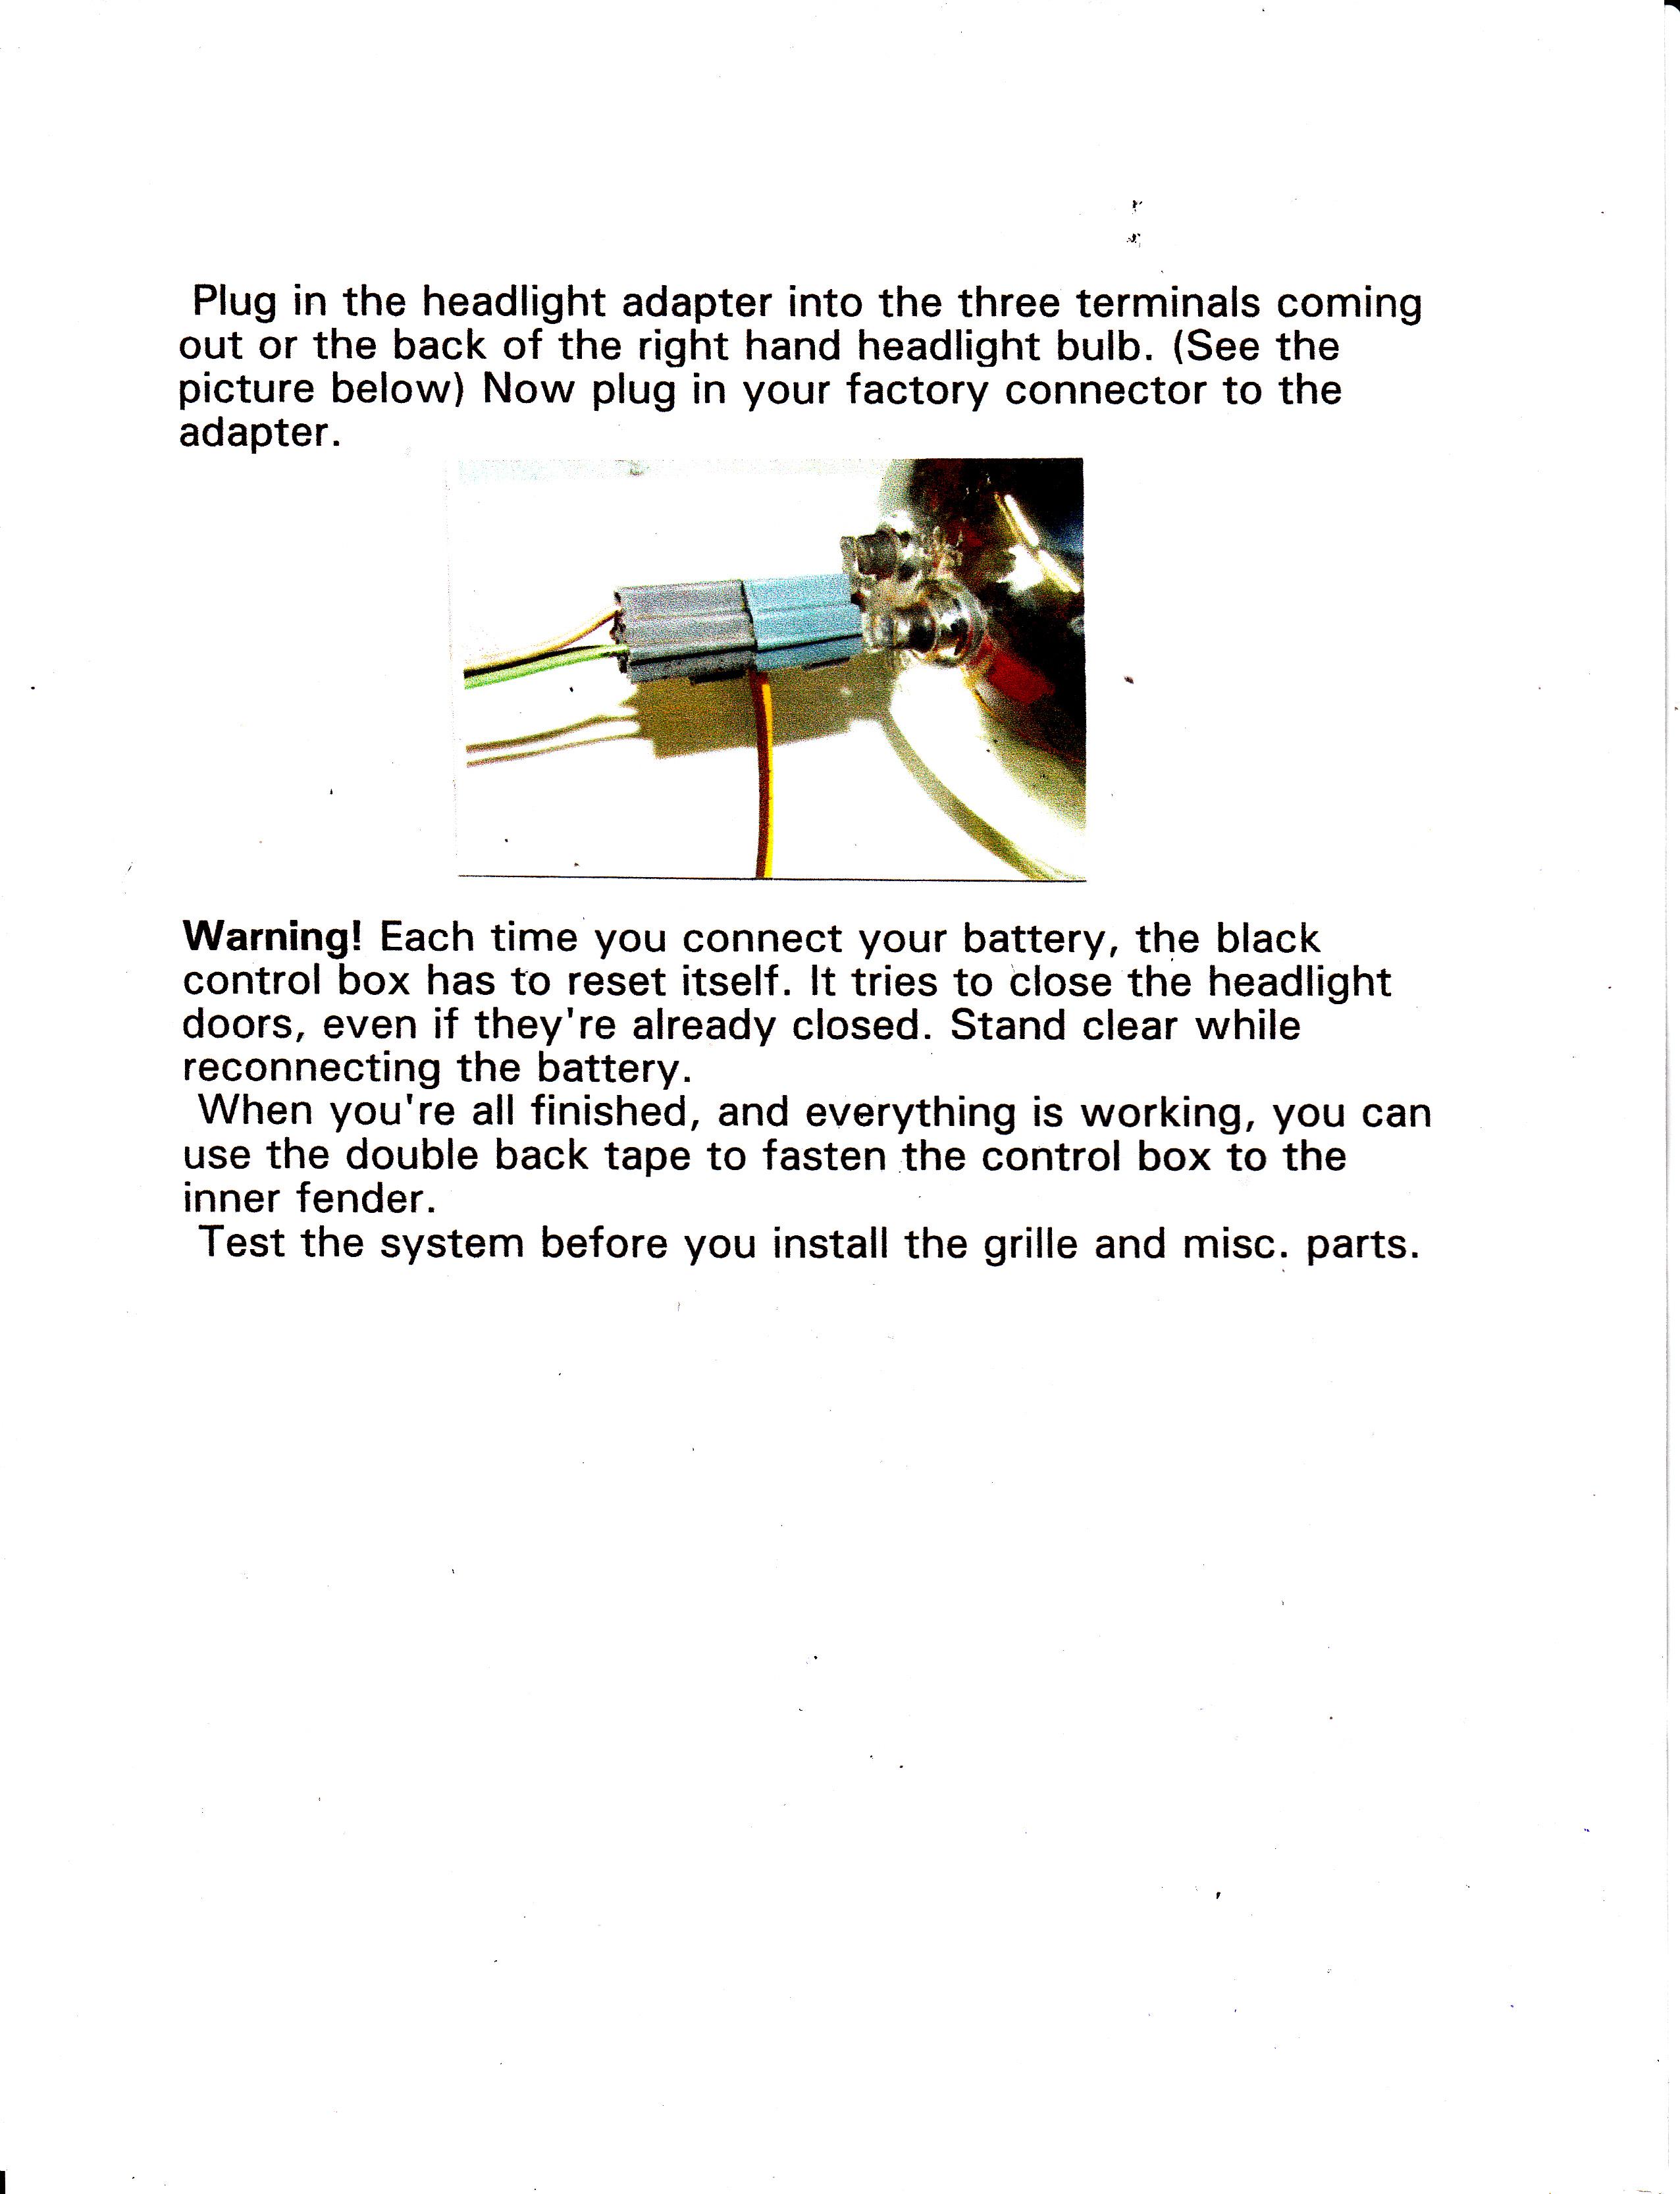 1967 Camaro Headlight Wiring Diagram - Wiring Diagram